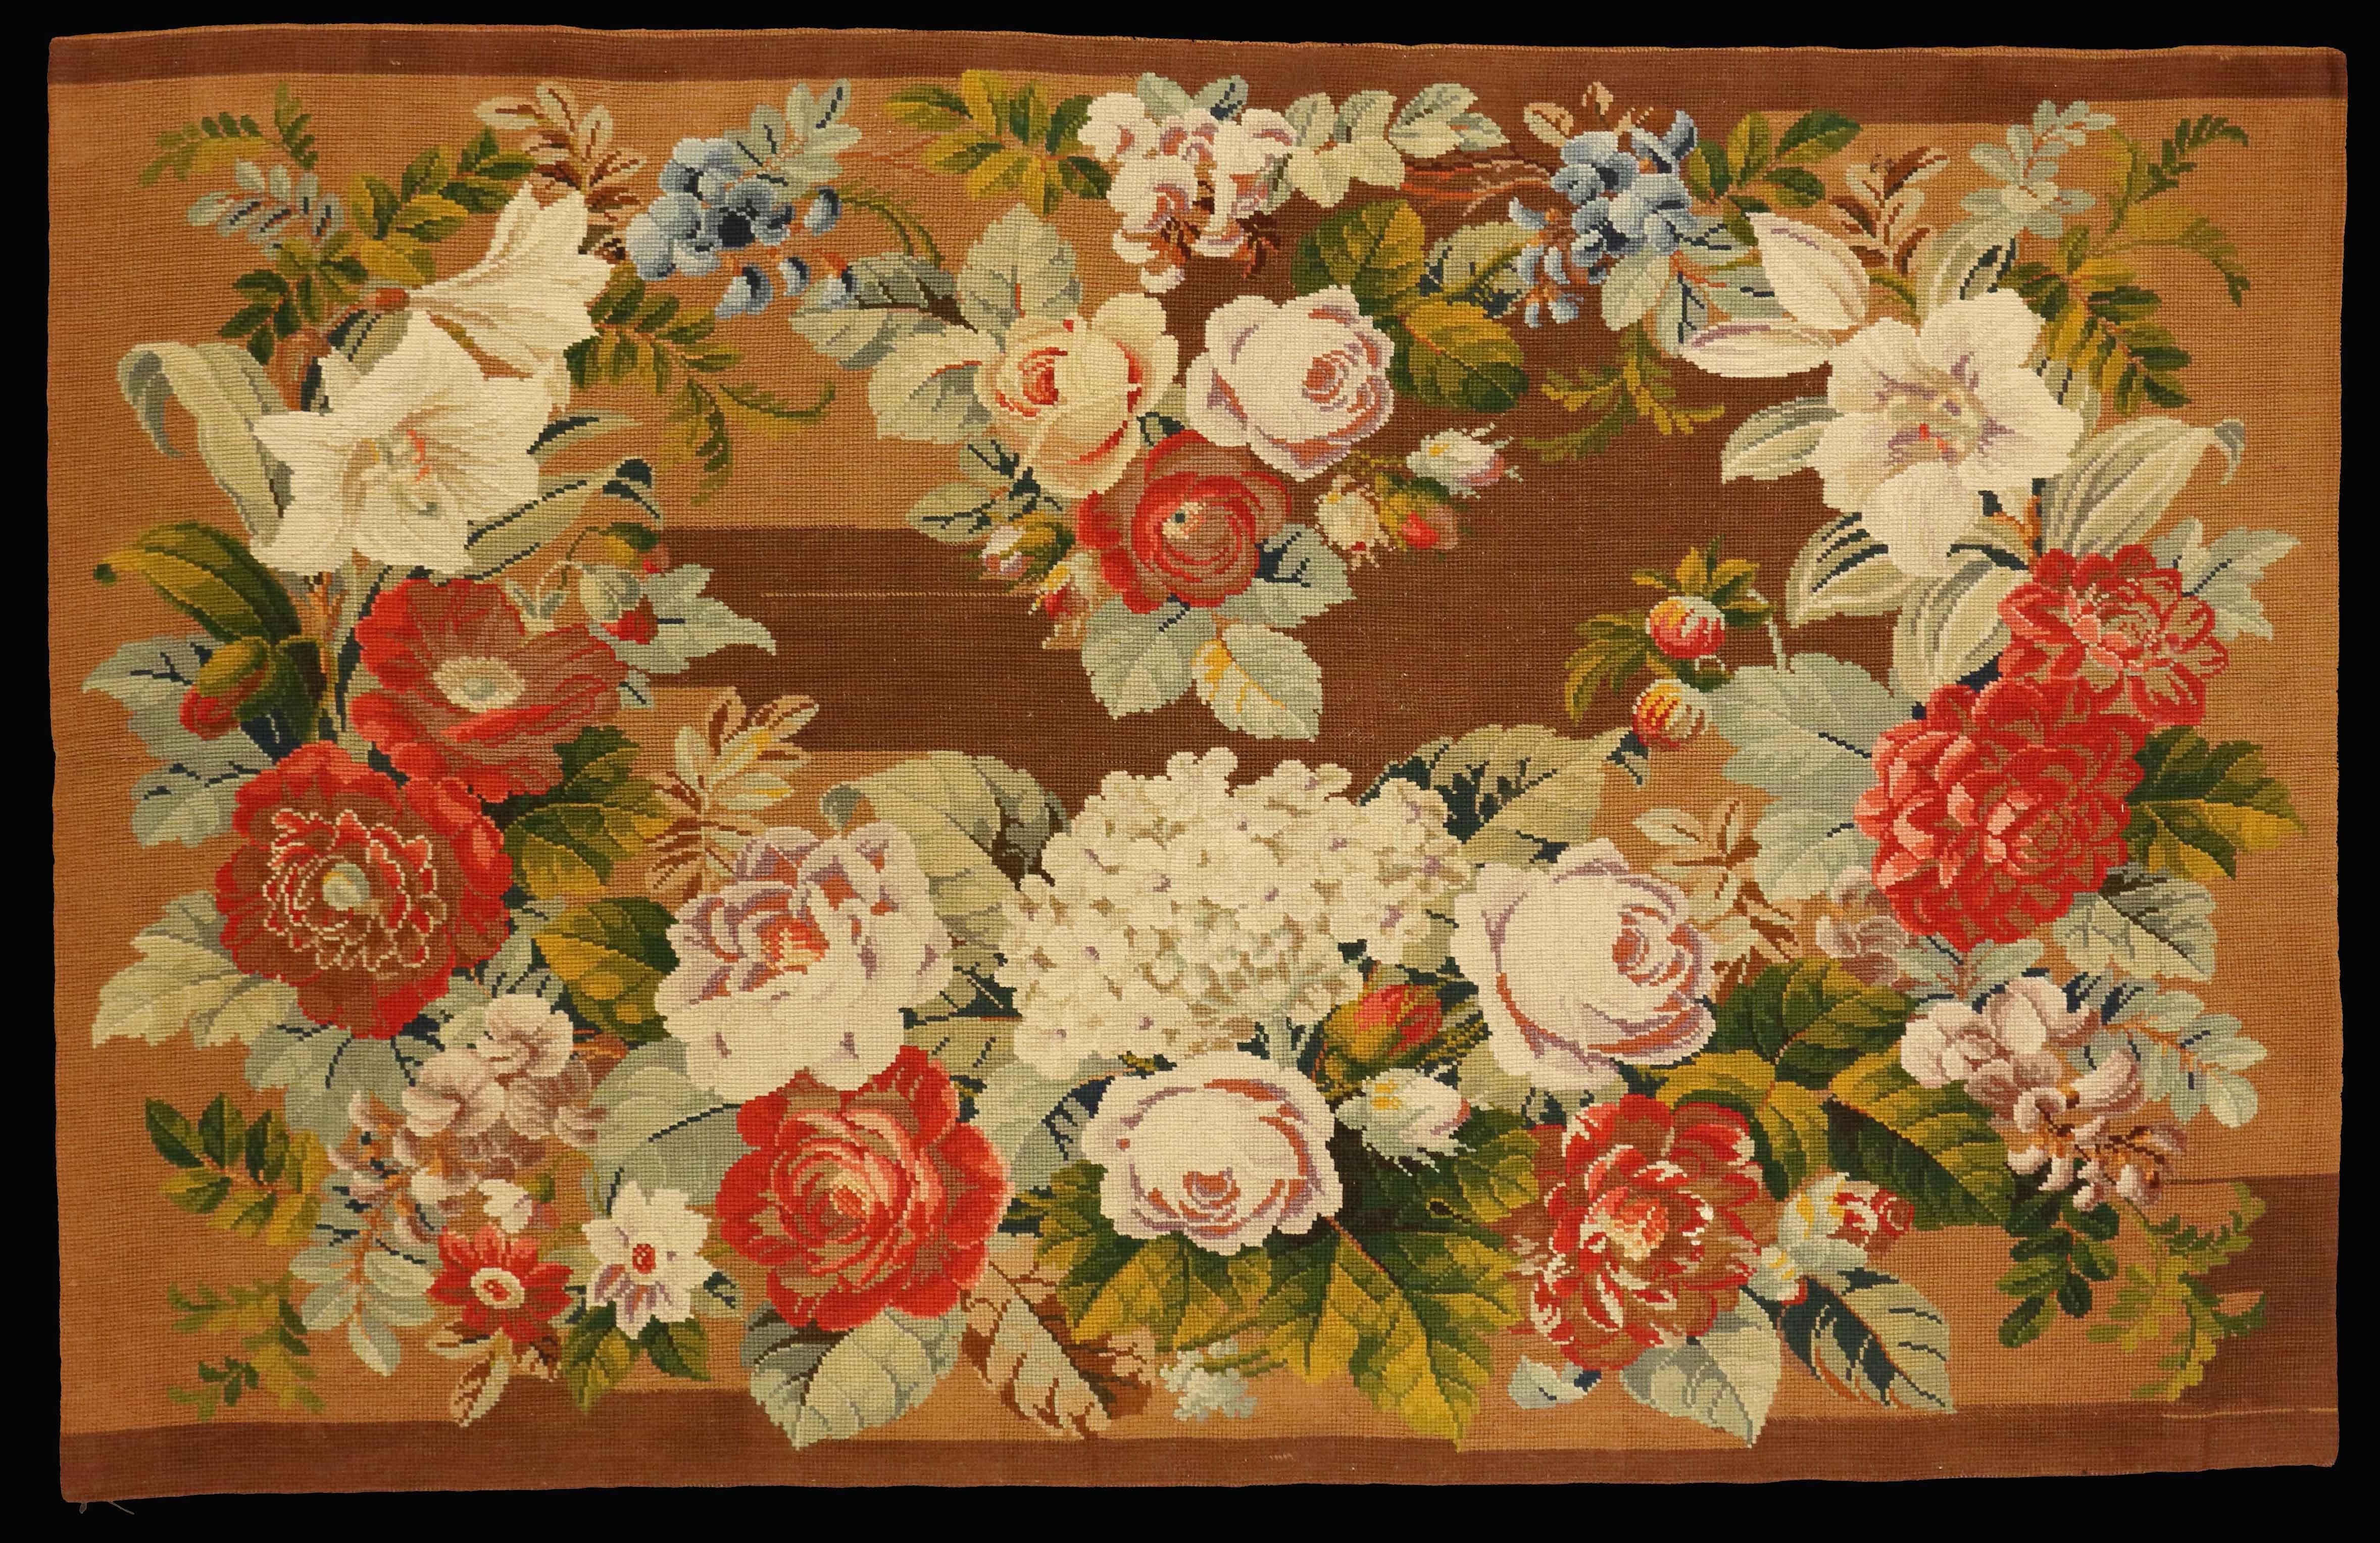 15669-english-needlework-rug-190cm-x-120cm